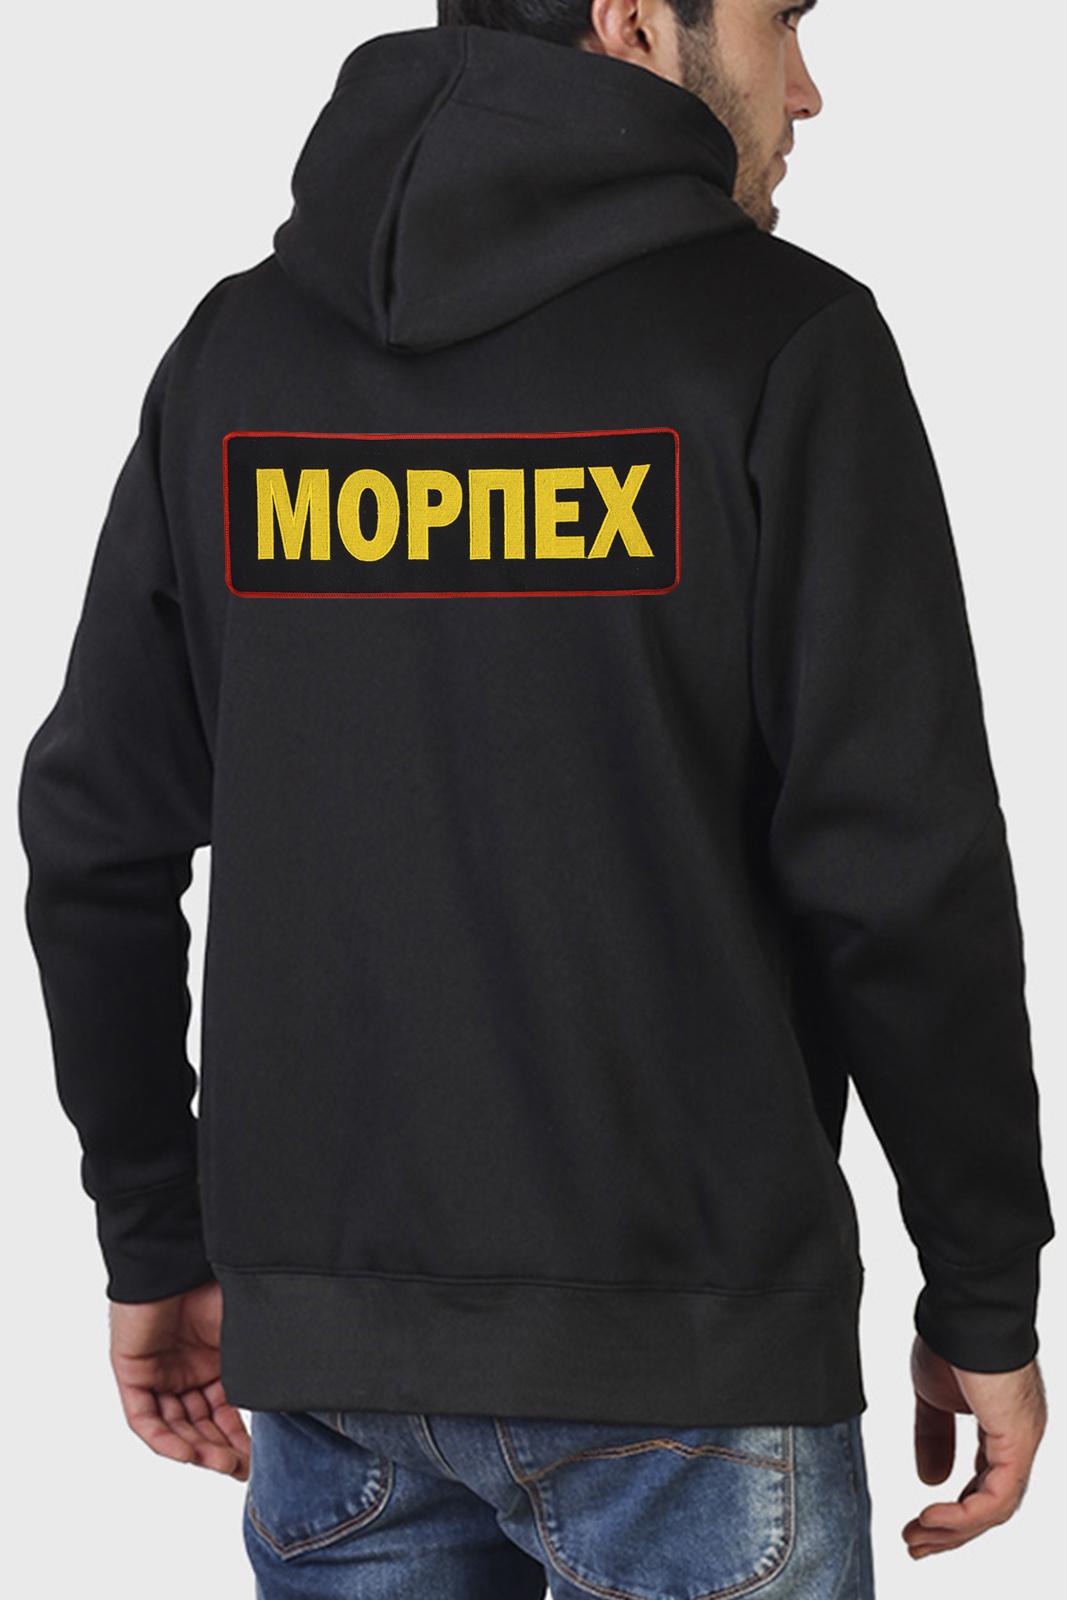 Милитари толстовка для гардероба Морпеха.